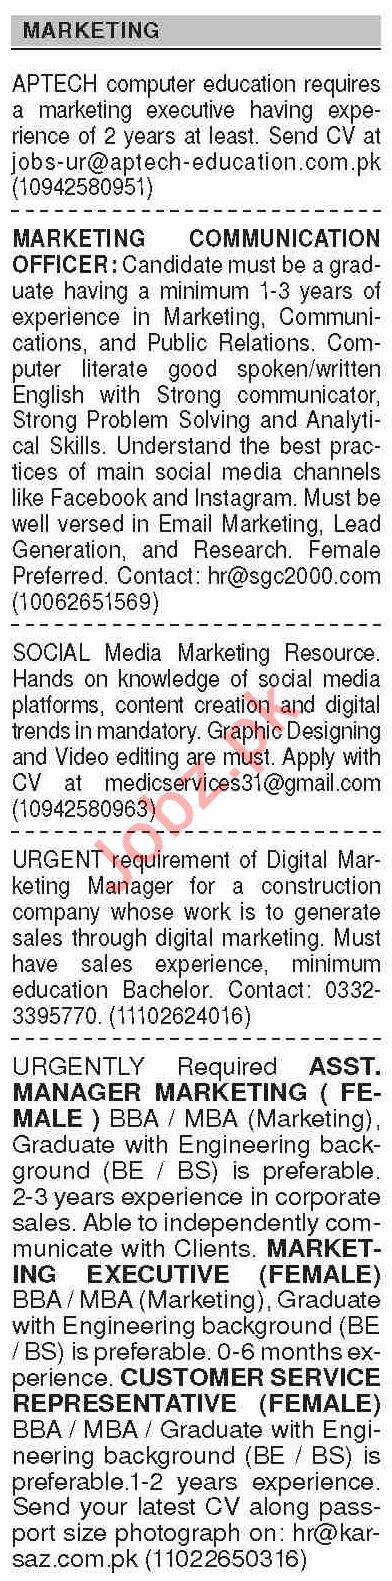 Dawn Sunday Classified Ads 25 Oct 2020 for Marketing Staff